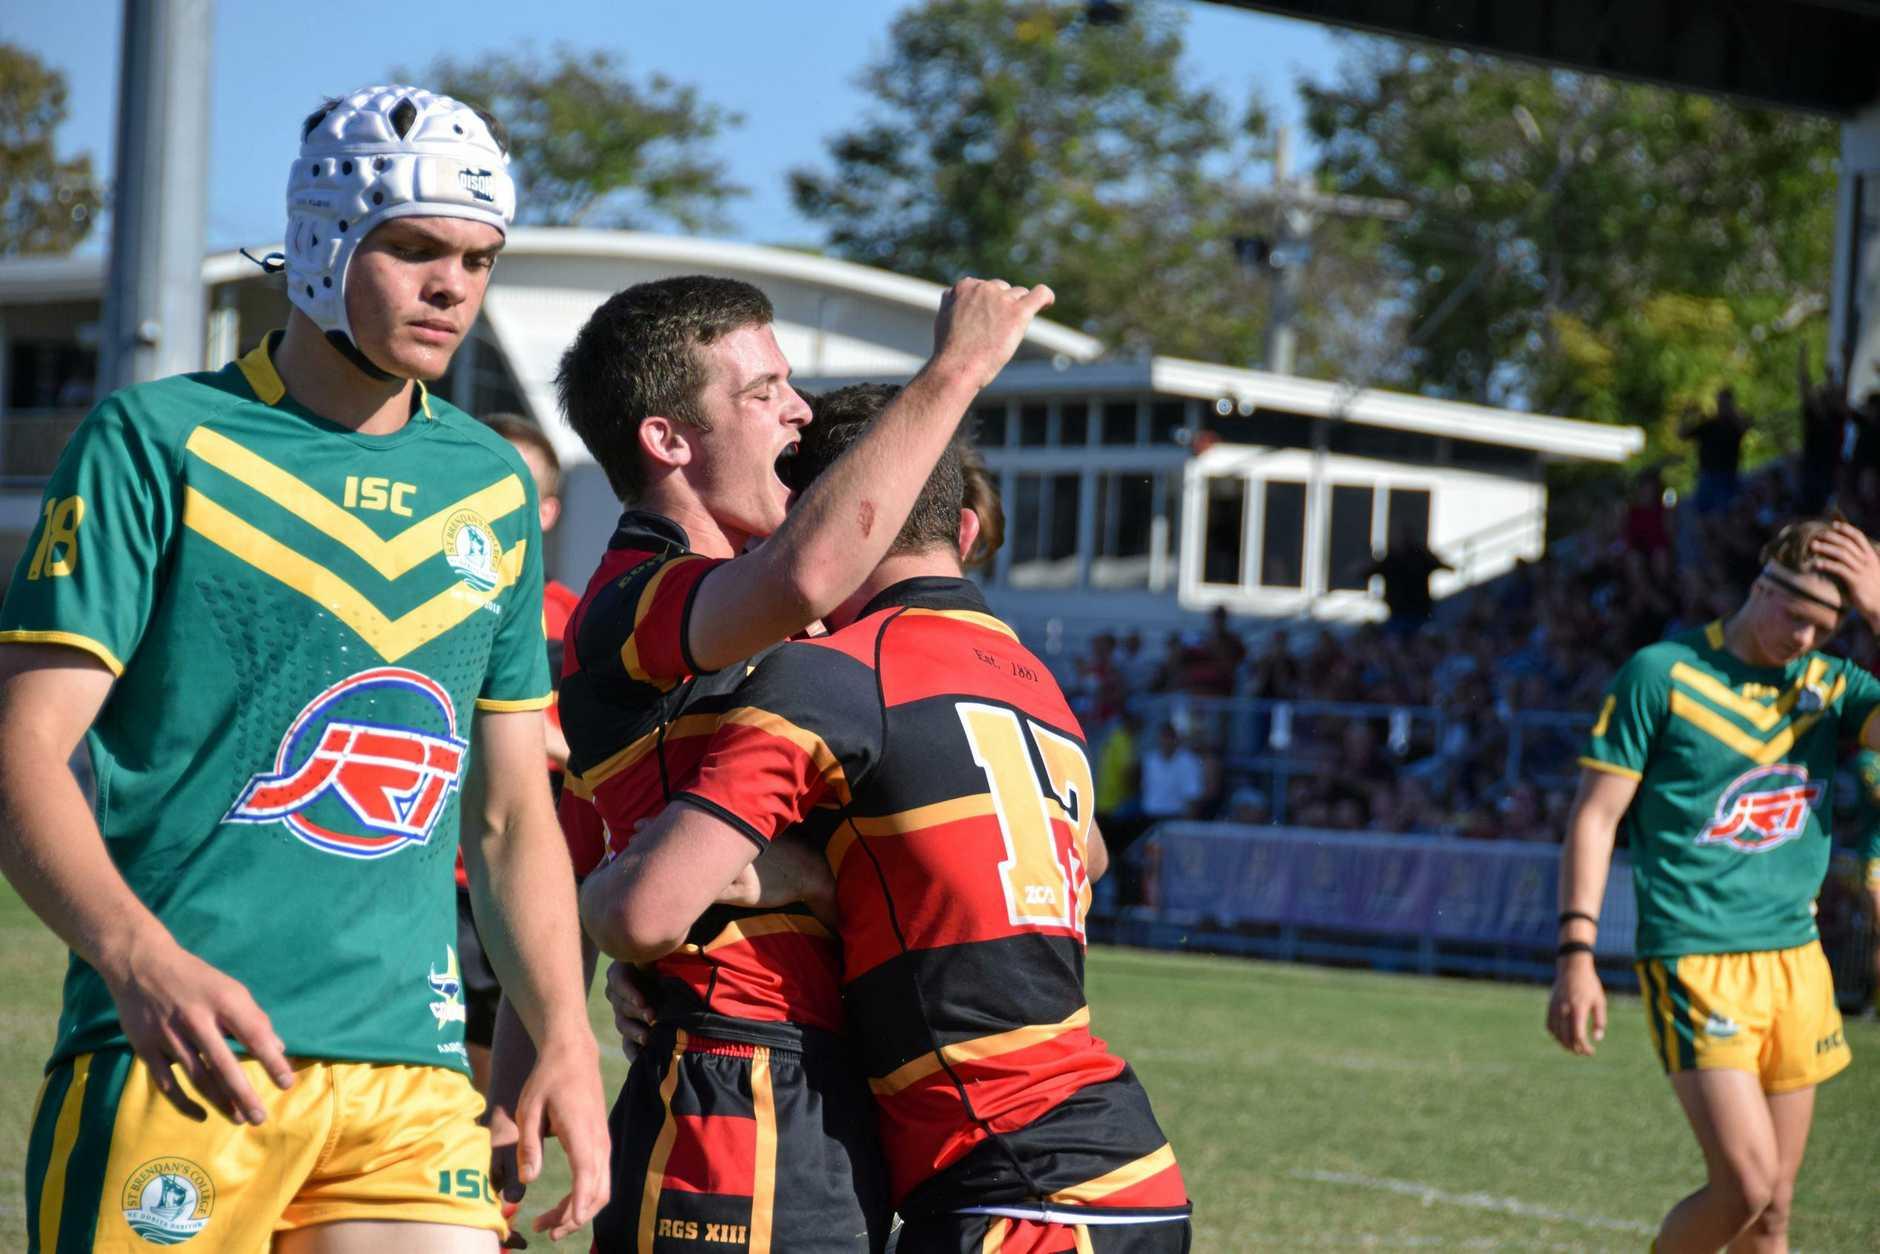 Rockhampton Grammar c0-captain Aaron Moore celebrates his team's thrilling victory.